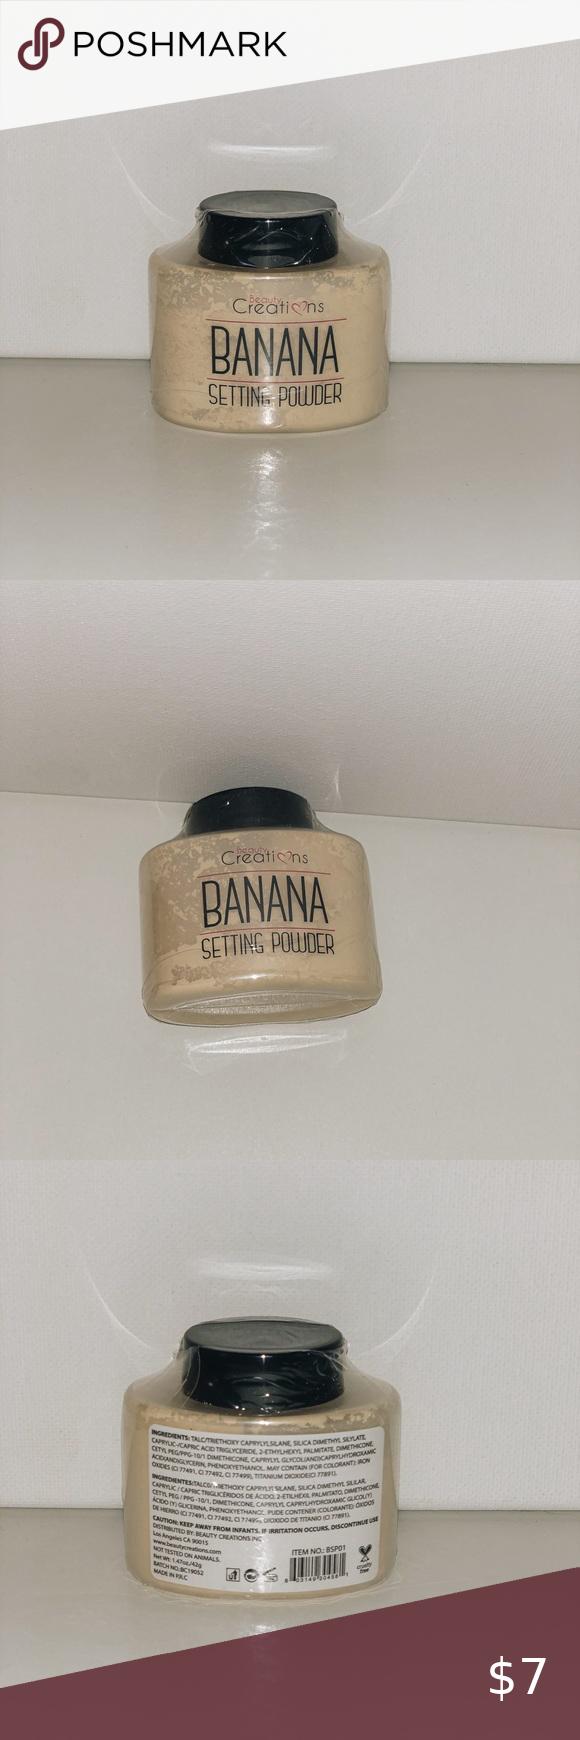 2 for 7 Beauty Creations Banana Powder in 2020 Beauty